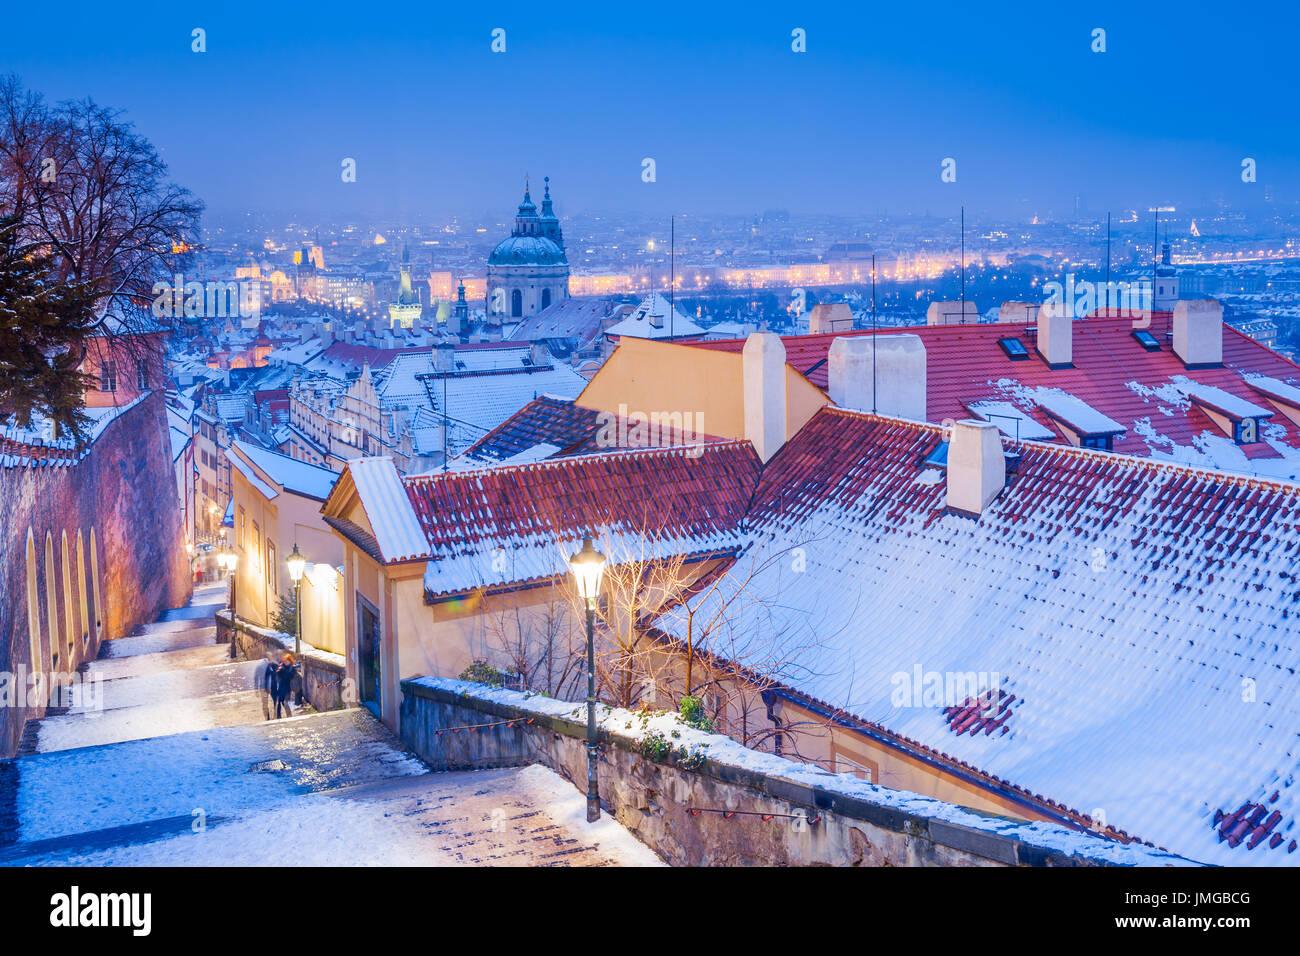 Europe, Czech Republic, Czechia, Prague, Praha, UNESCO, Panorama with Church of Saint Nicholas, Kostel Svateho Mikulase, Stock Photo